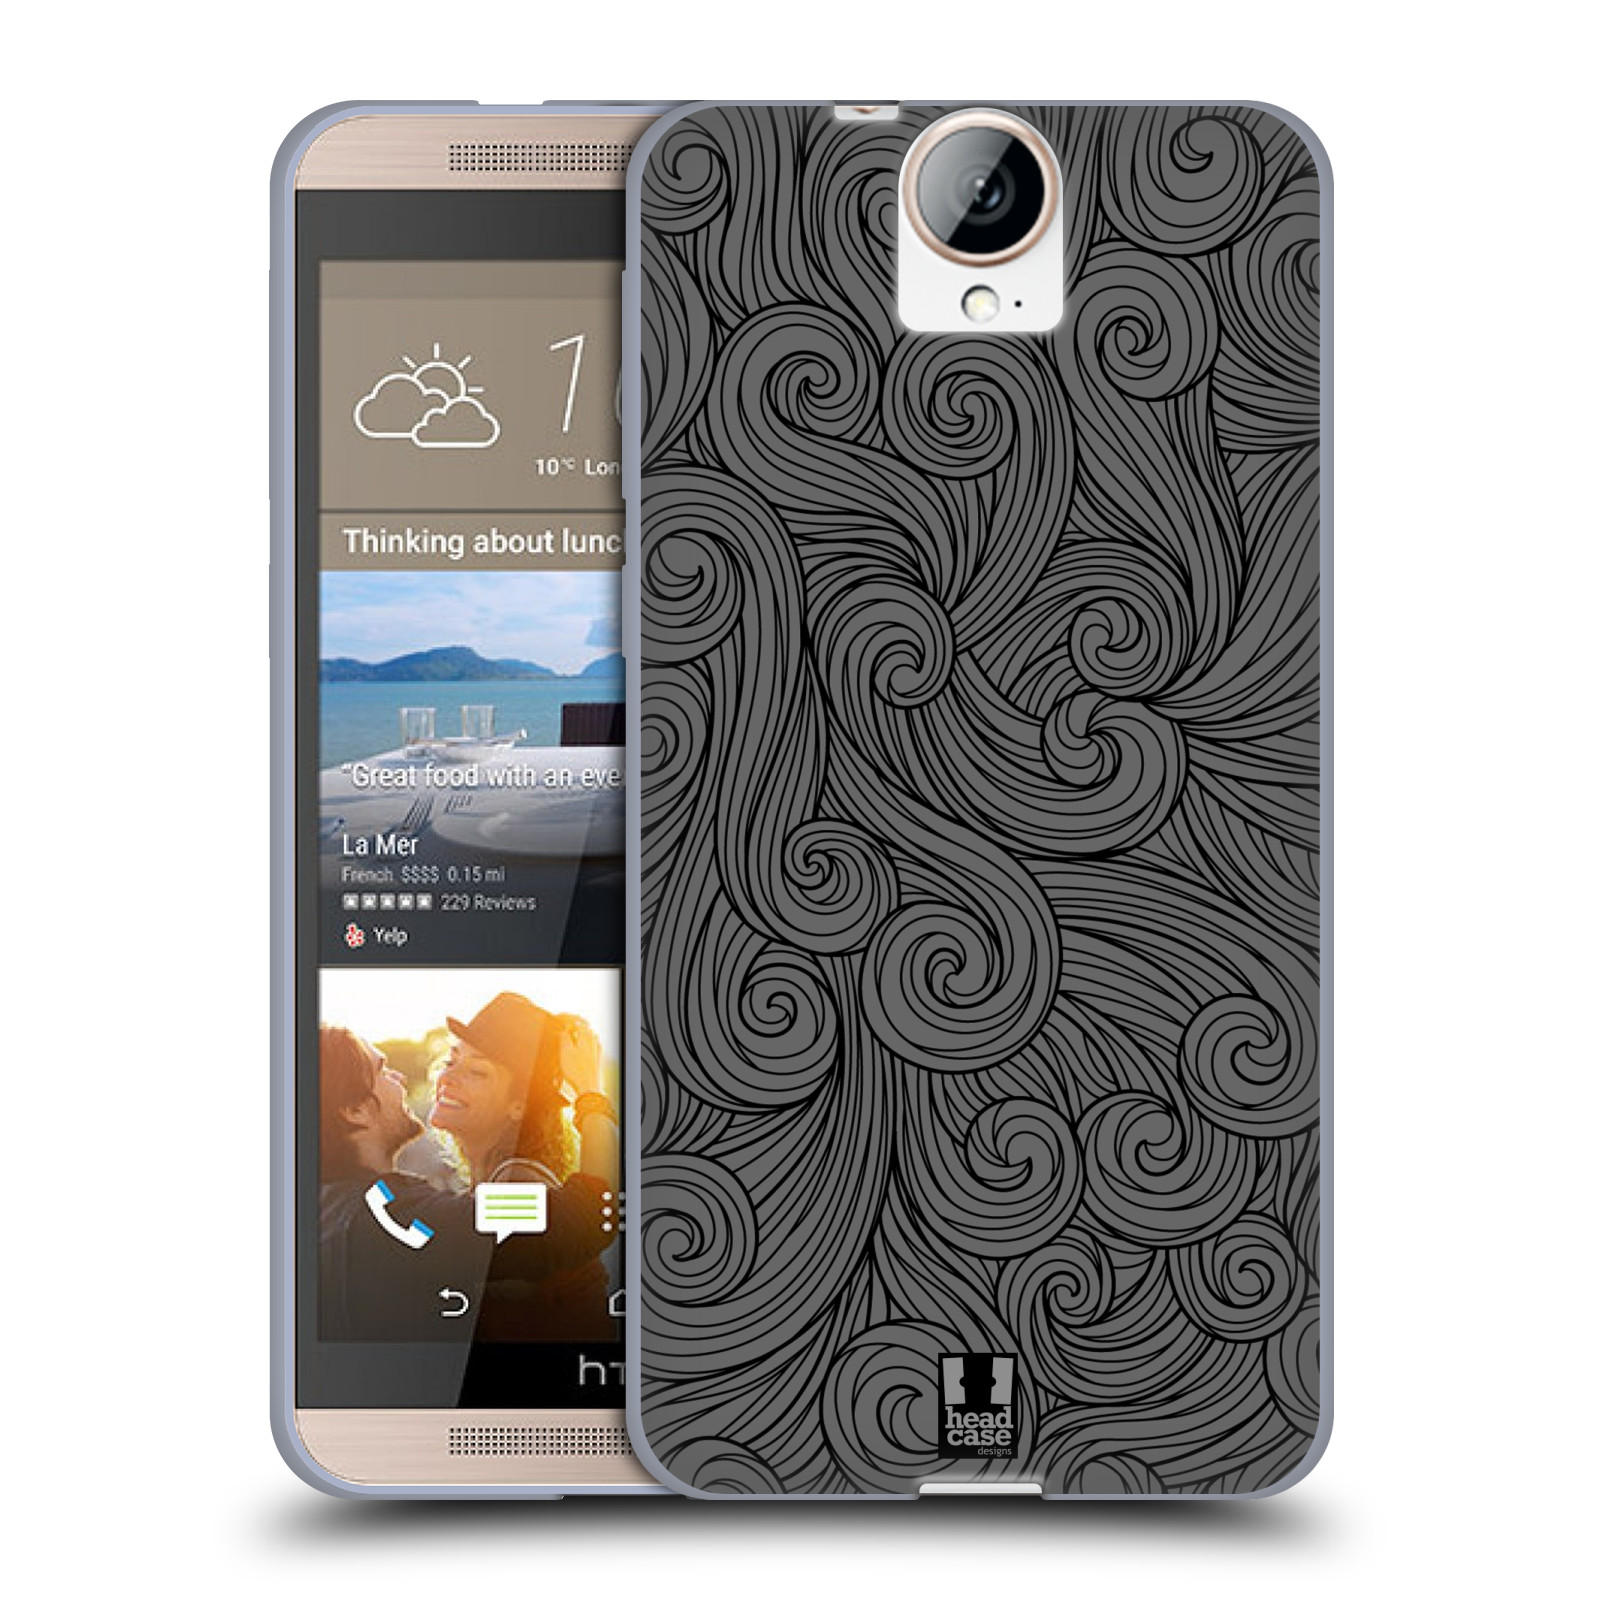 Silikonové pouzdro na mobil HTC One E9+(Plus) HEAD CASE Dark Grey Swirls (Silikonový kryt či obal na mobilní telefon HTC One E9+)